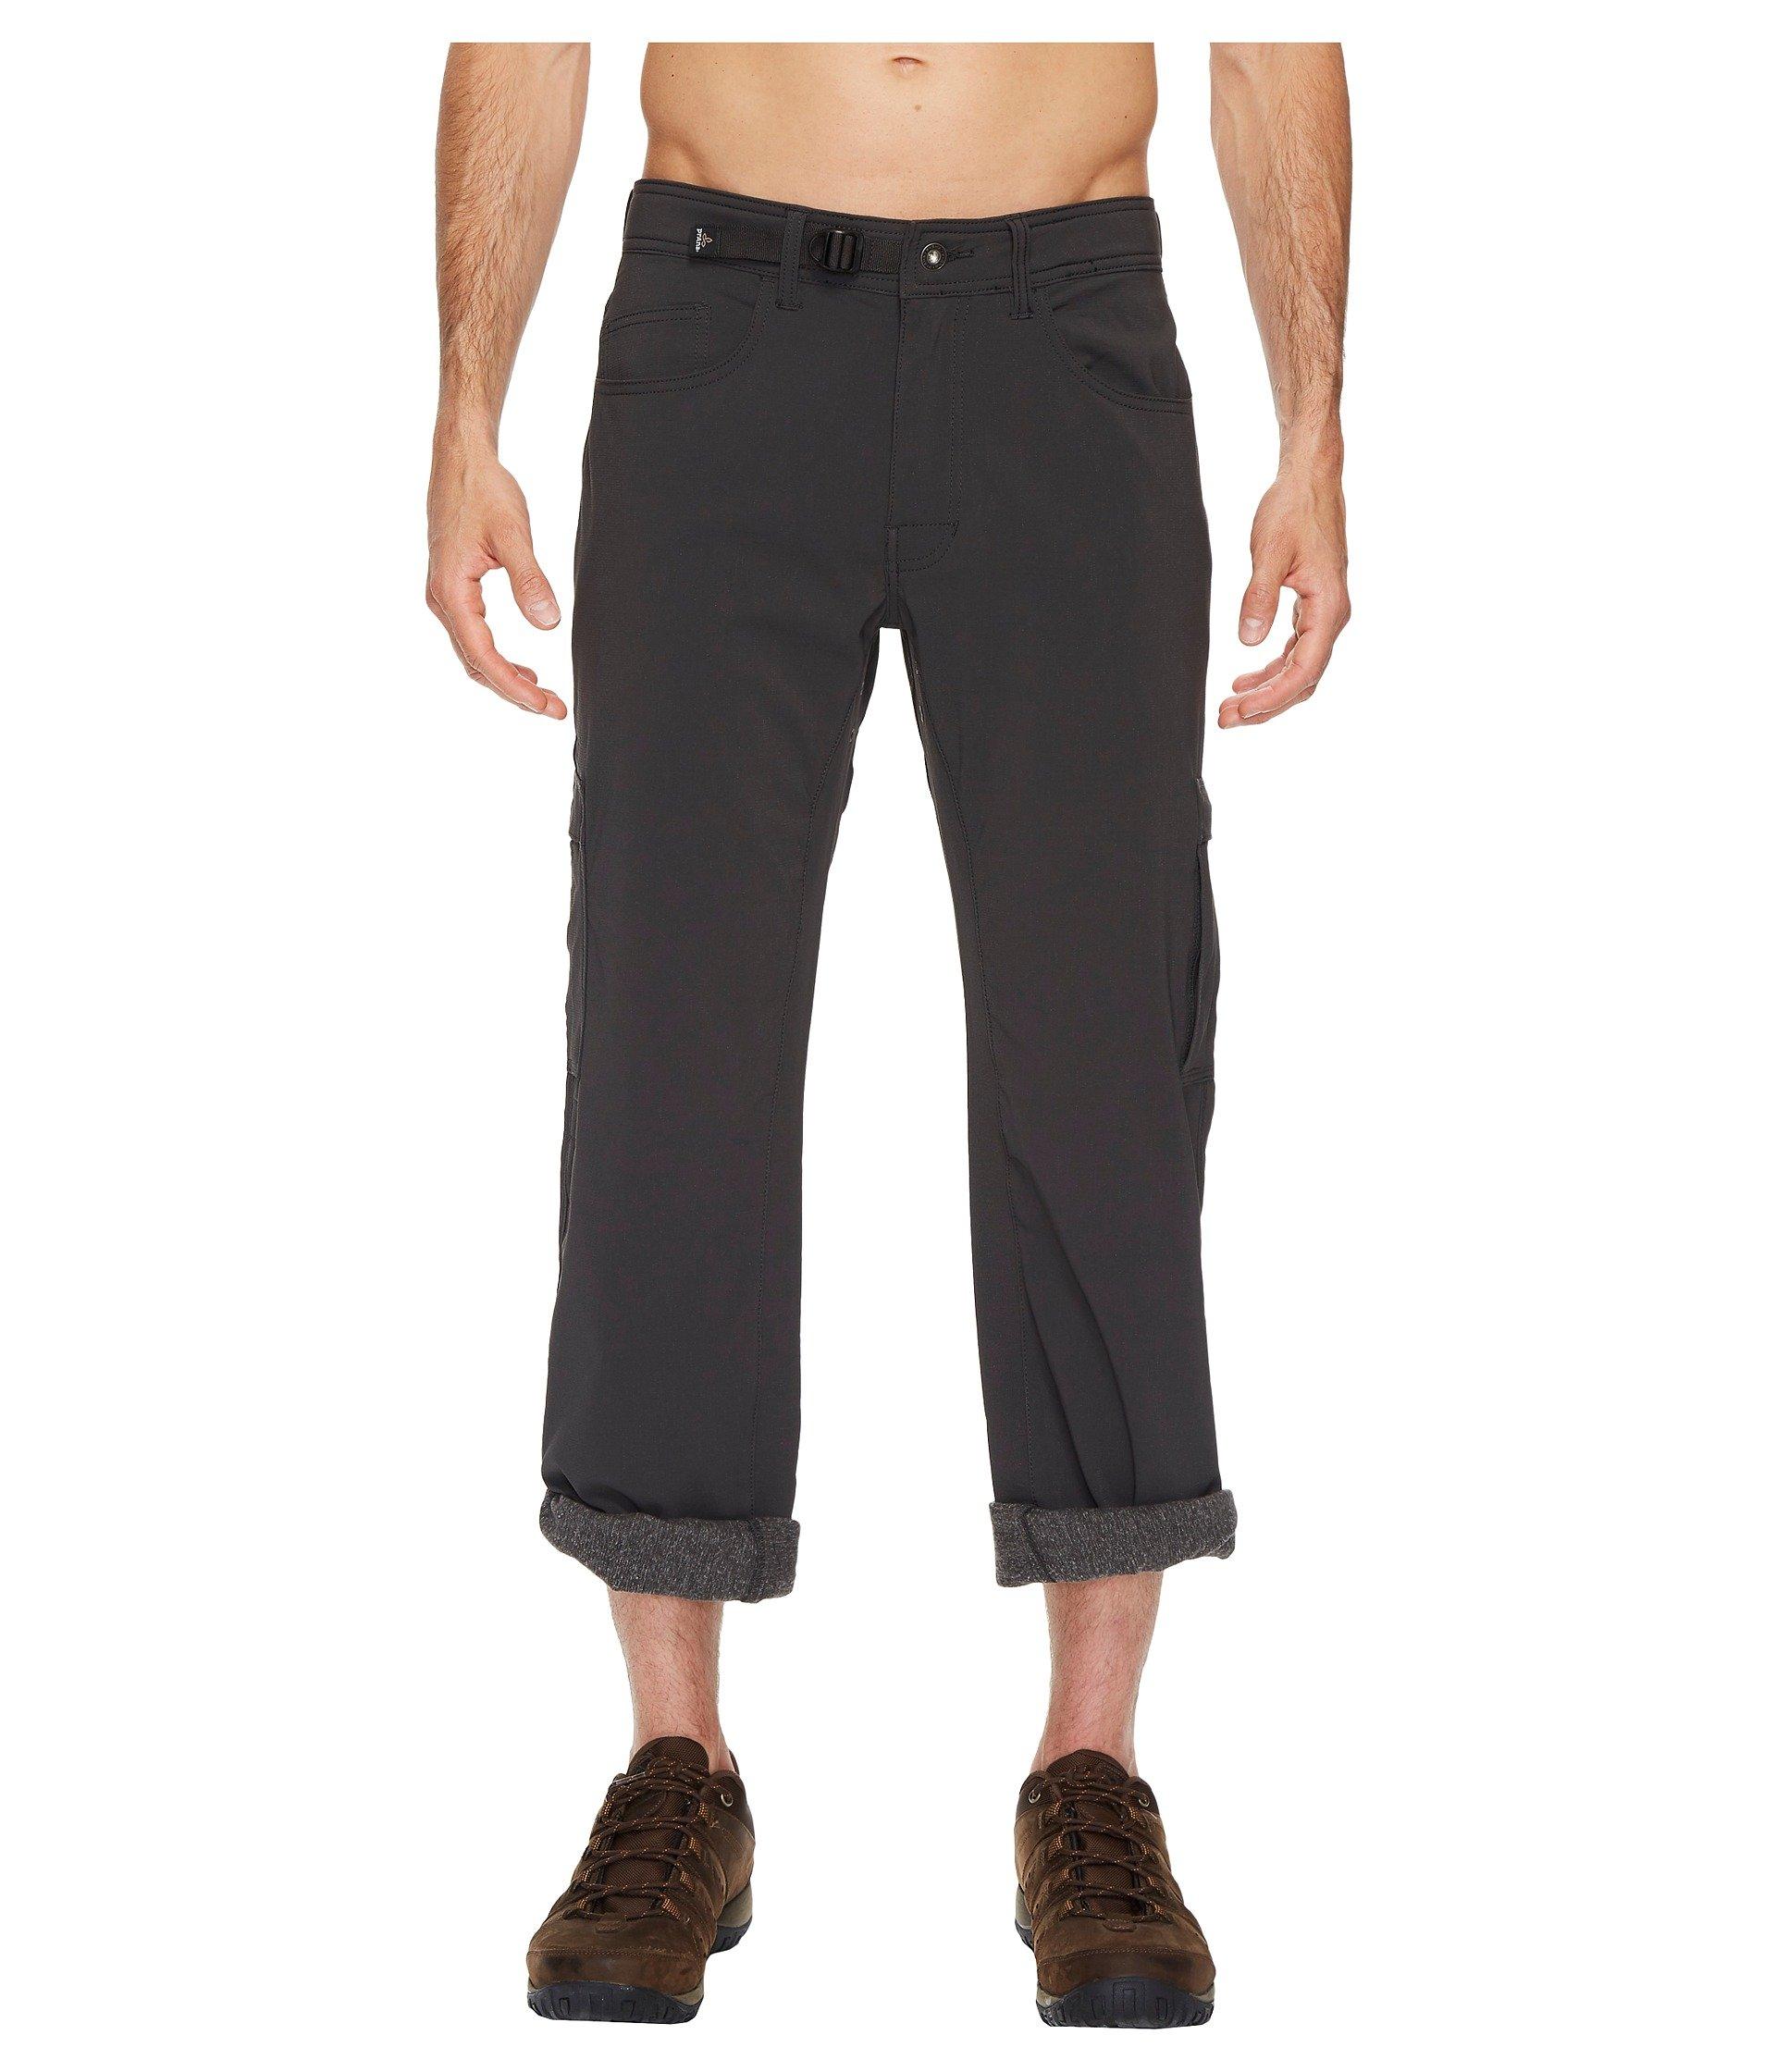 Zion Prana Winter Winter Pants Charcoal Zion Pants Prana Charcoal S665xvrwdq